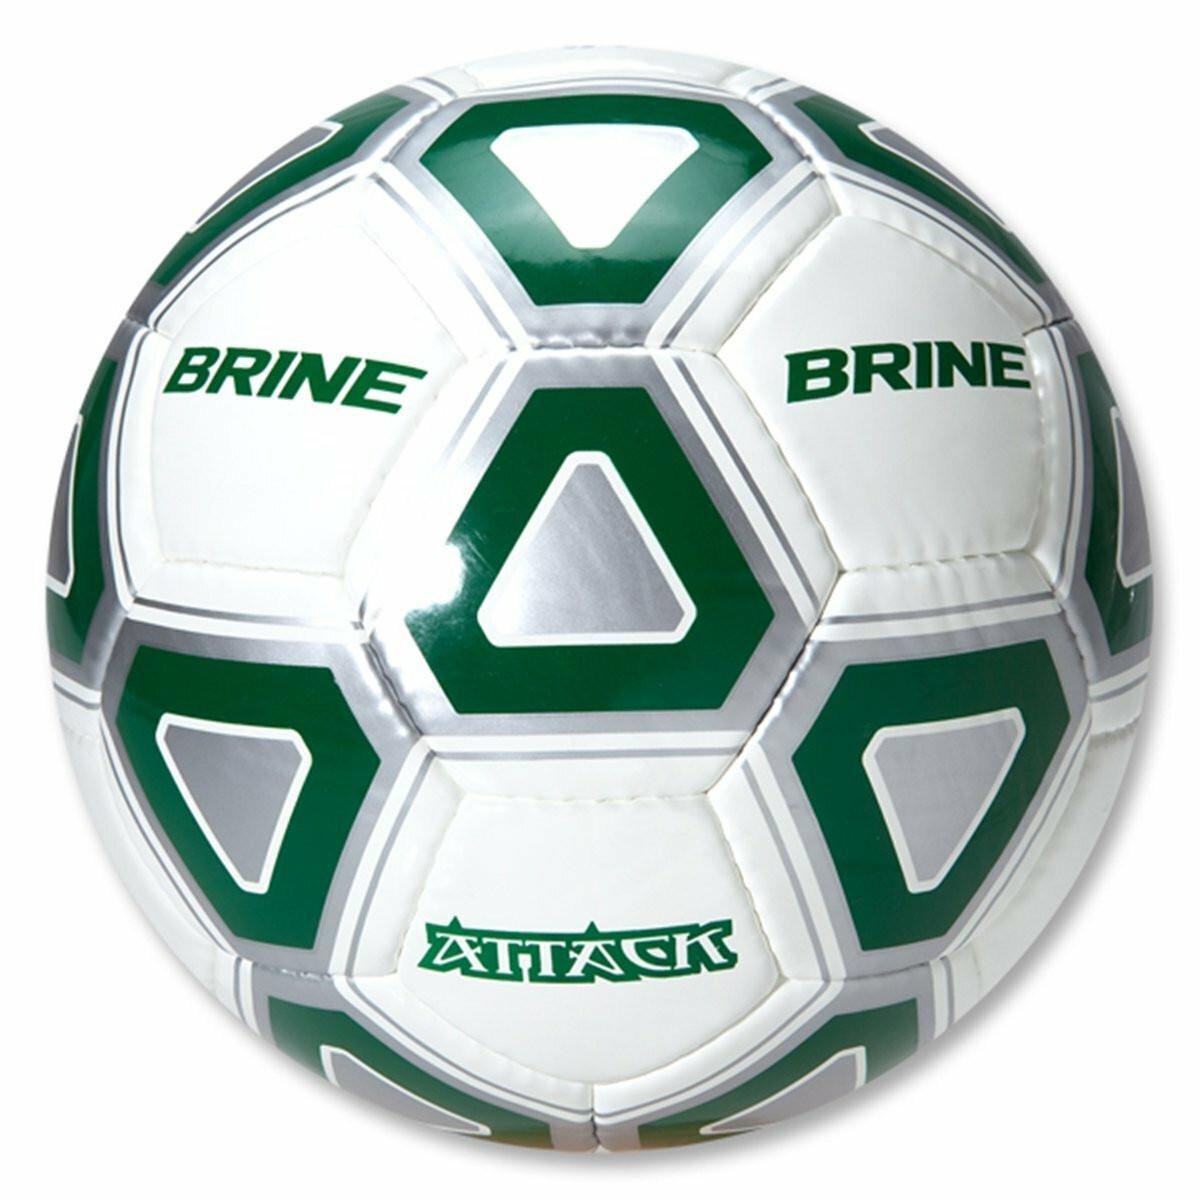 Brine Attack Soccer Ball